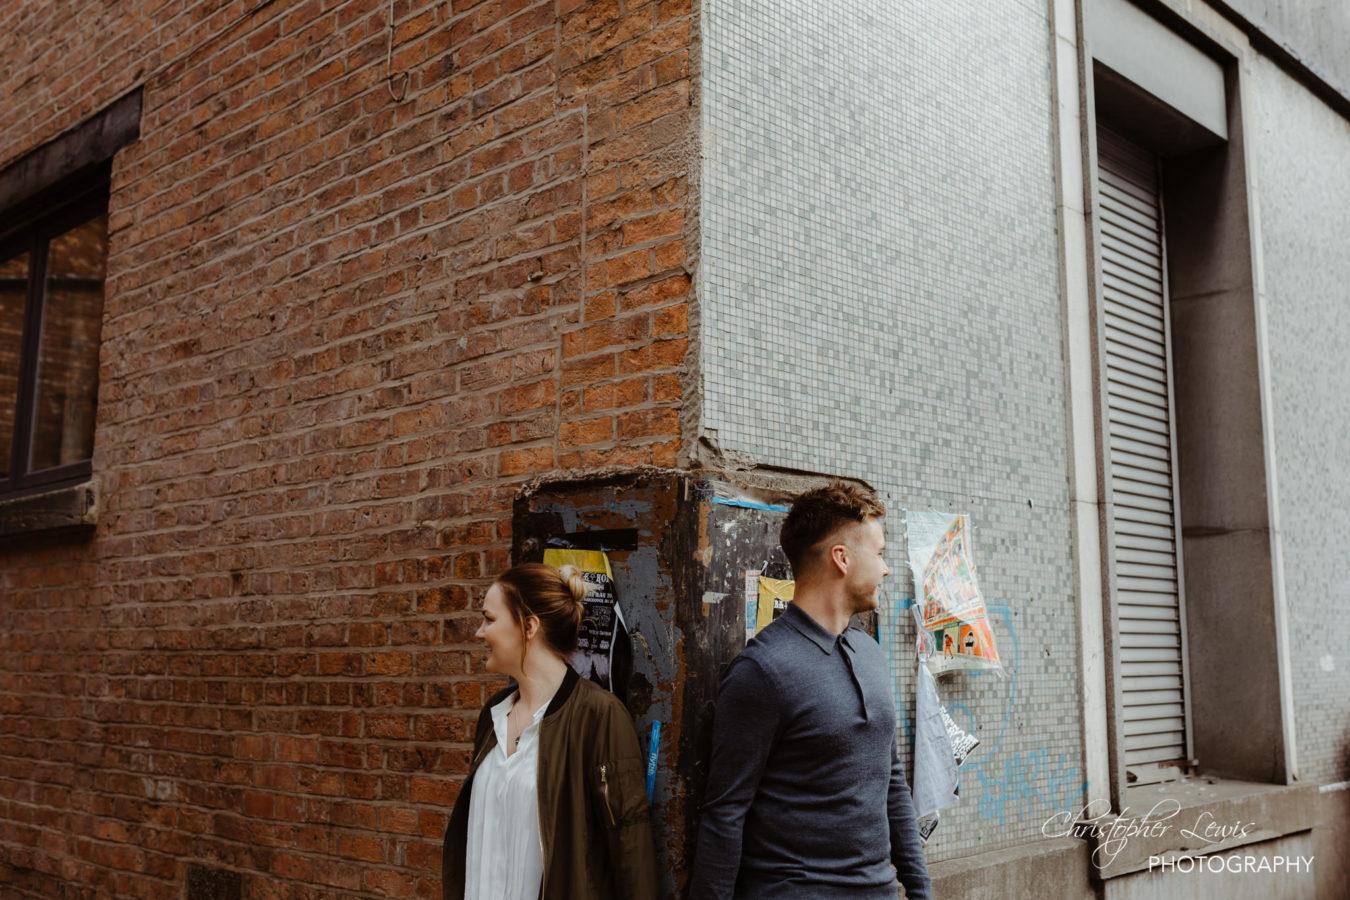 Northern-Quarter-Manchester-Pre-Wedding-Photoshoot-33